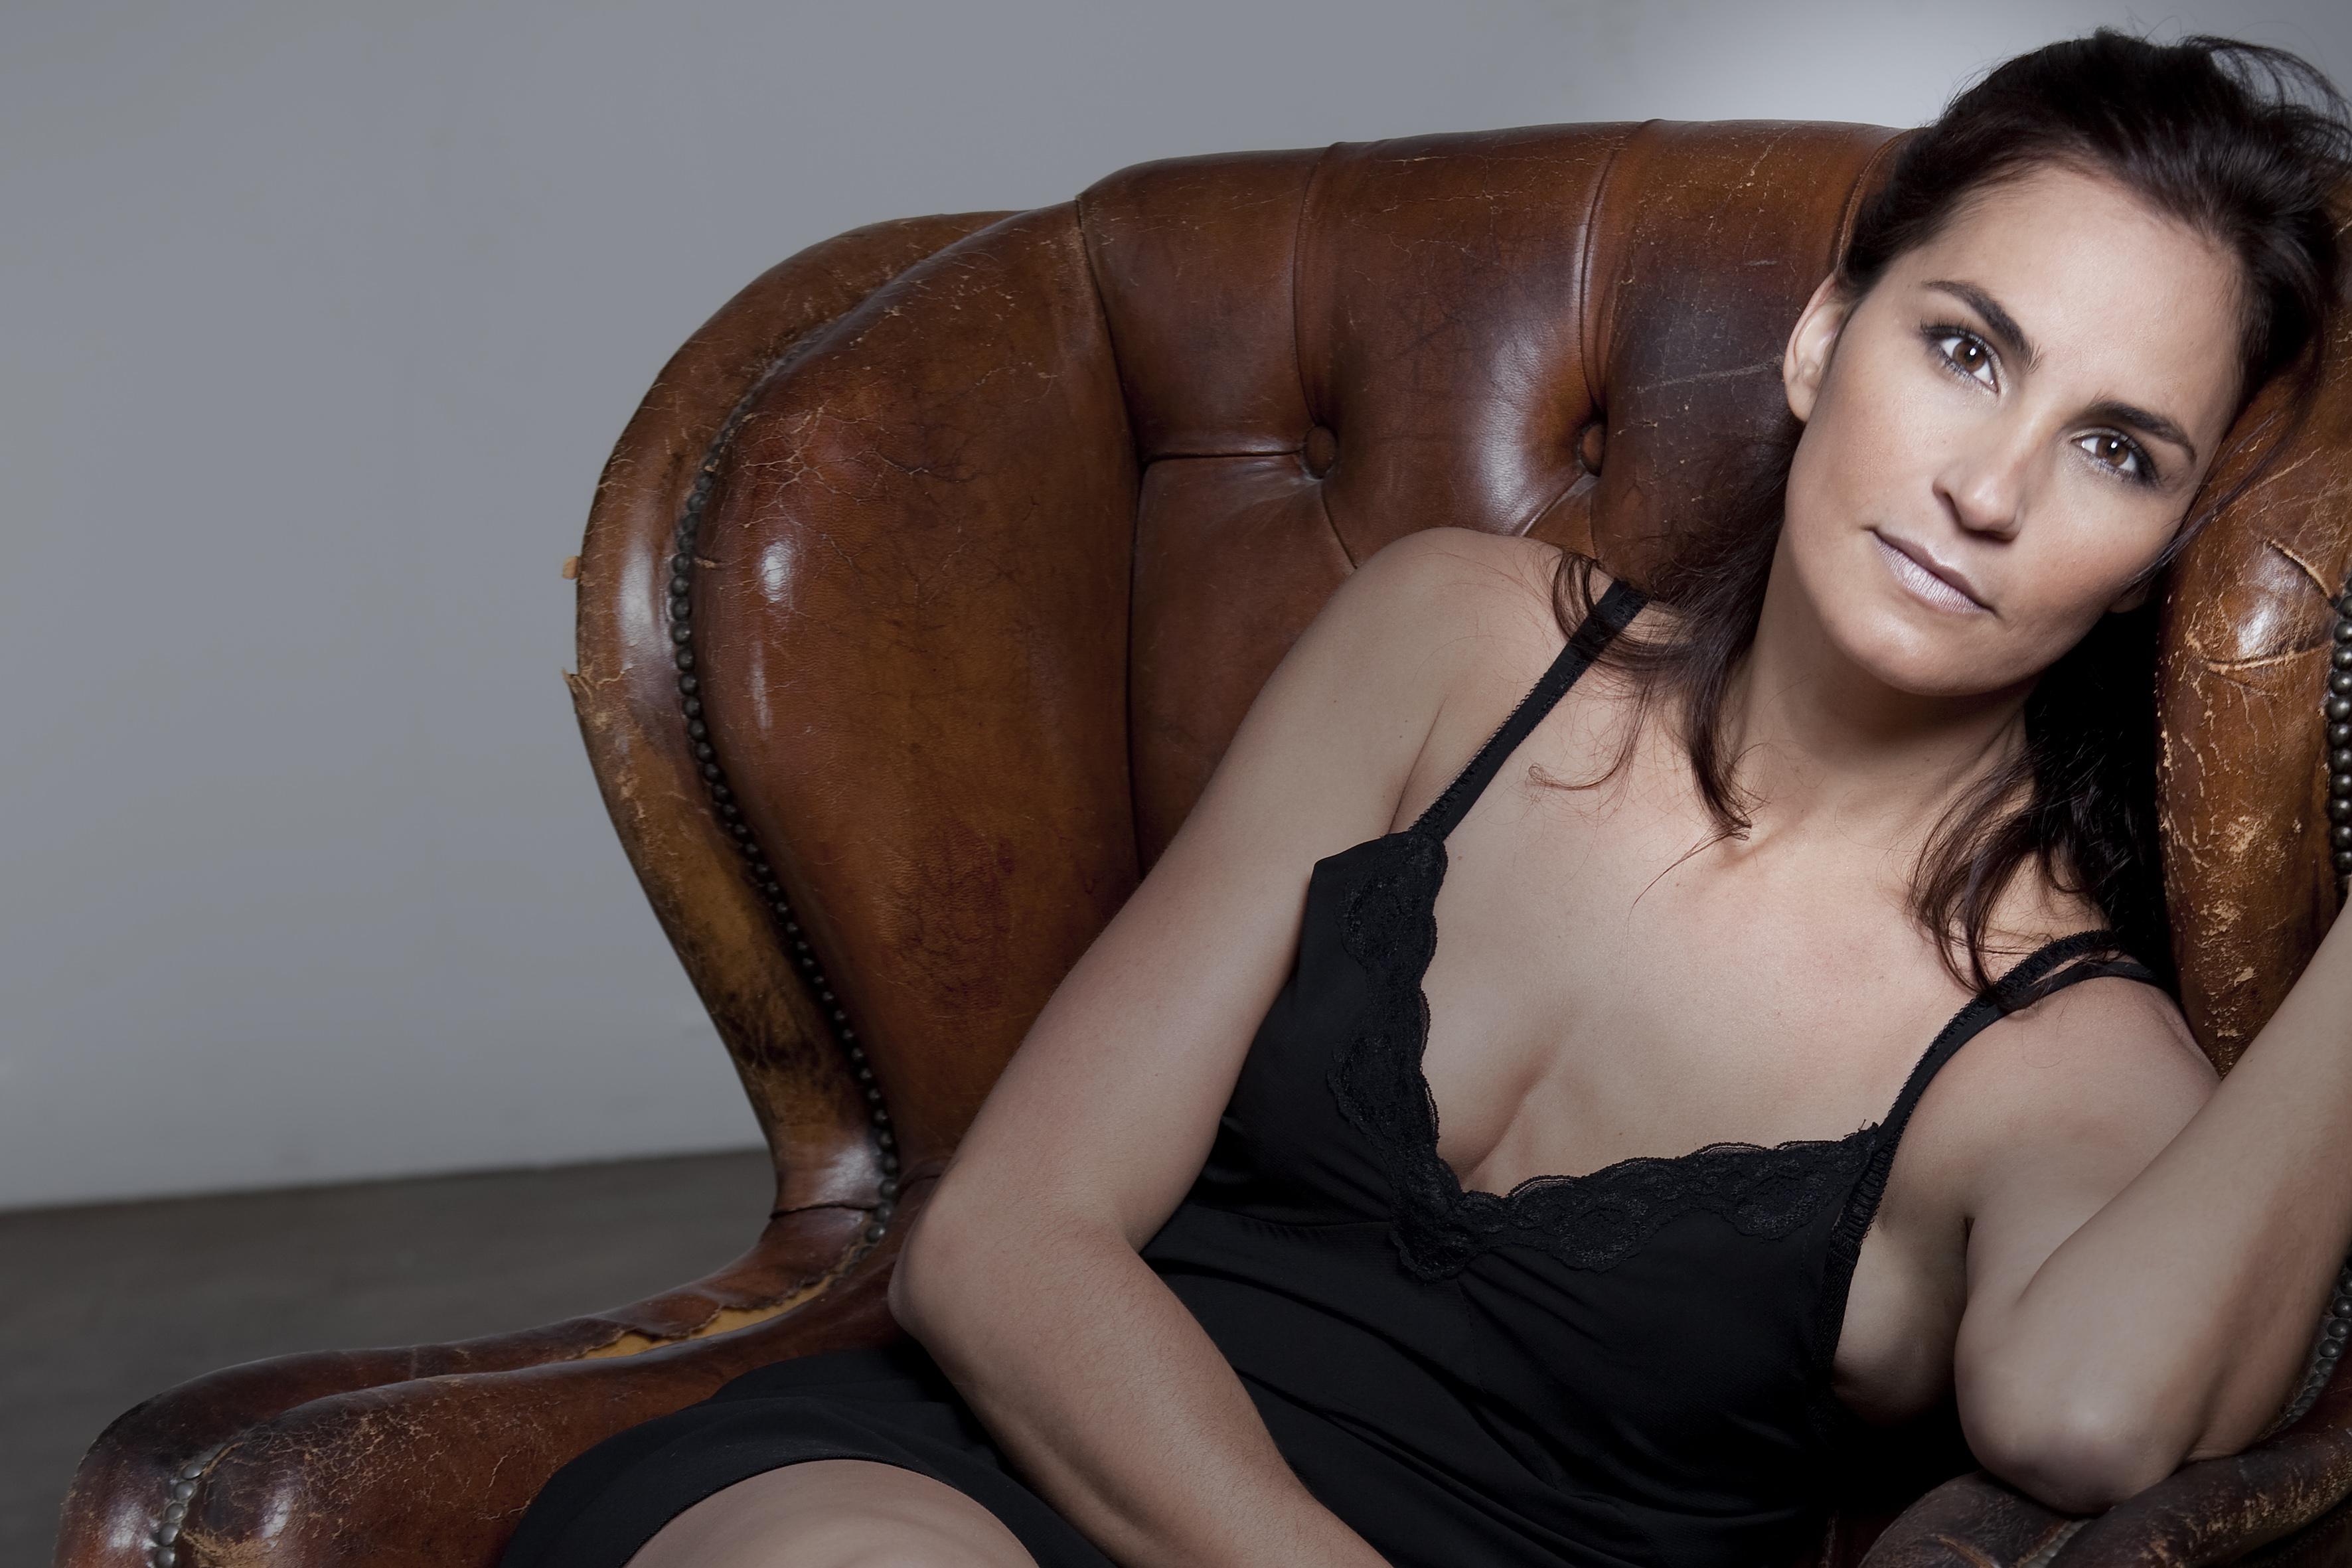 Sonia Dorado, Photo by Iván Hidalgo